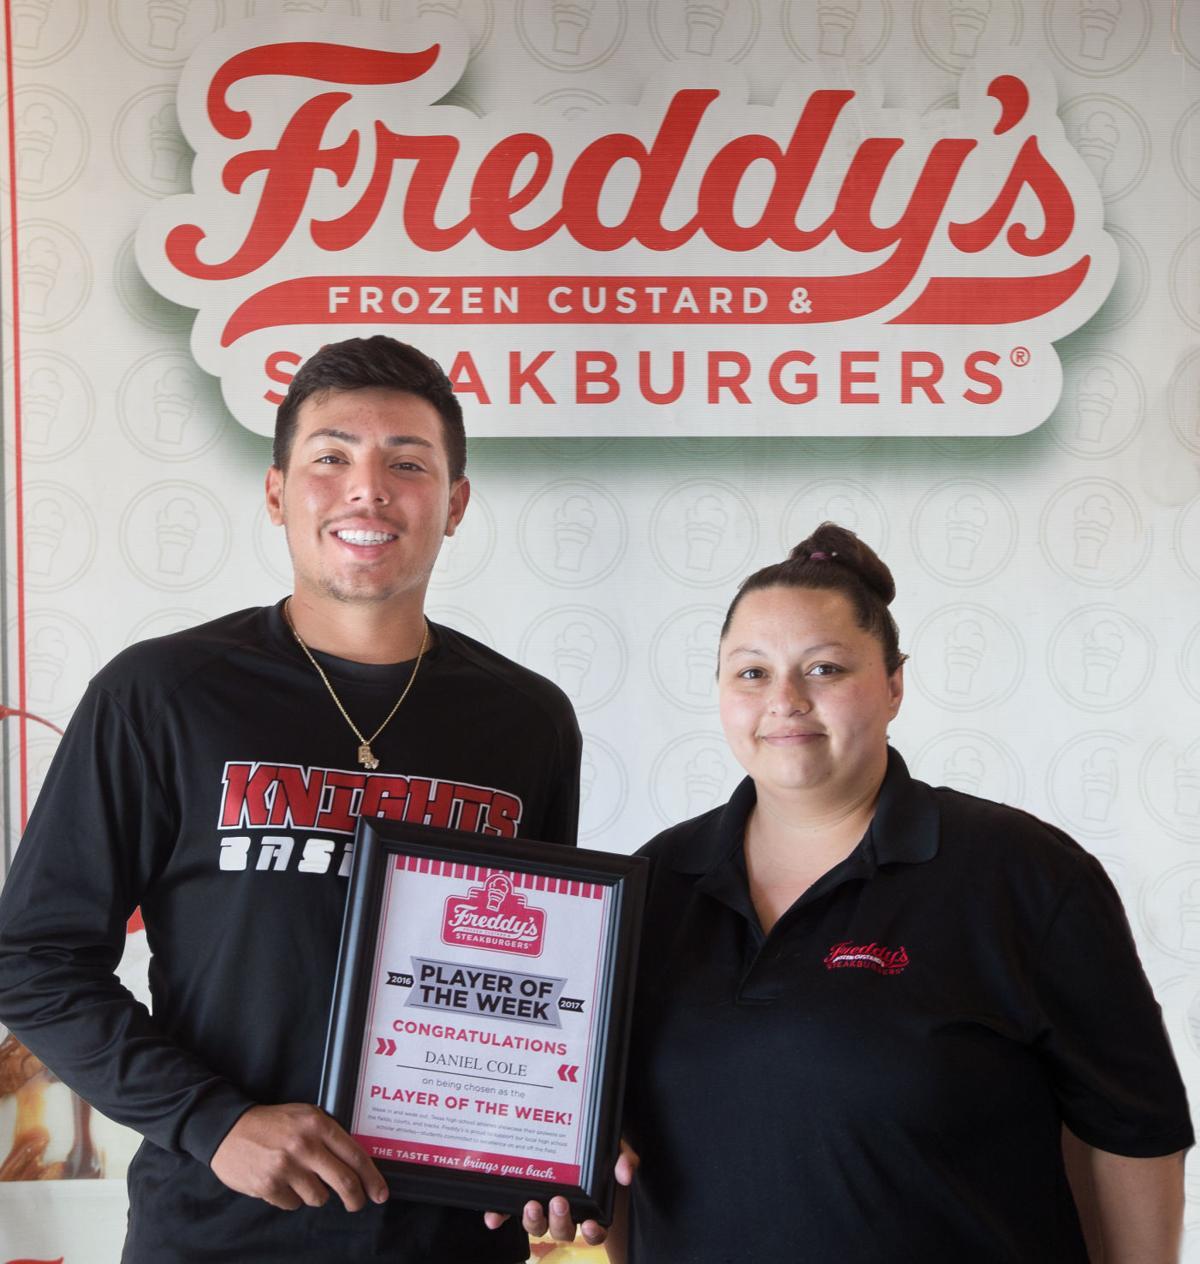 Freddy's-KDHpressbox.com Player of the Week Daniel Cole